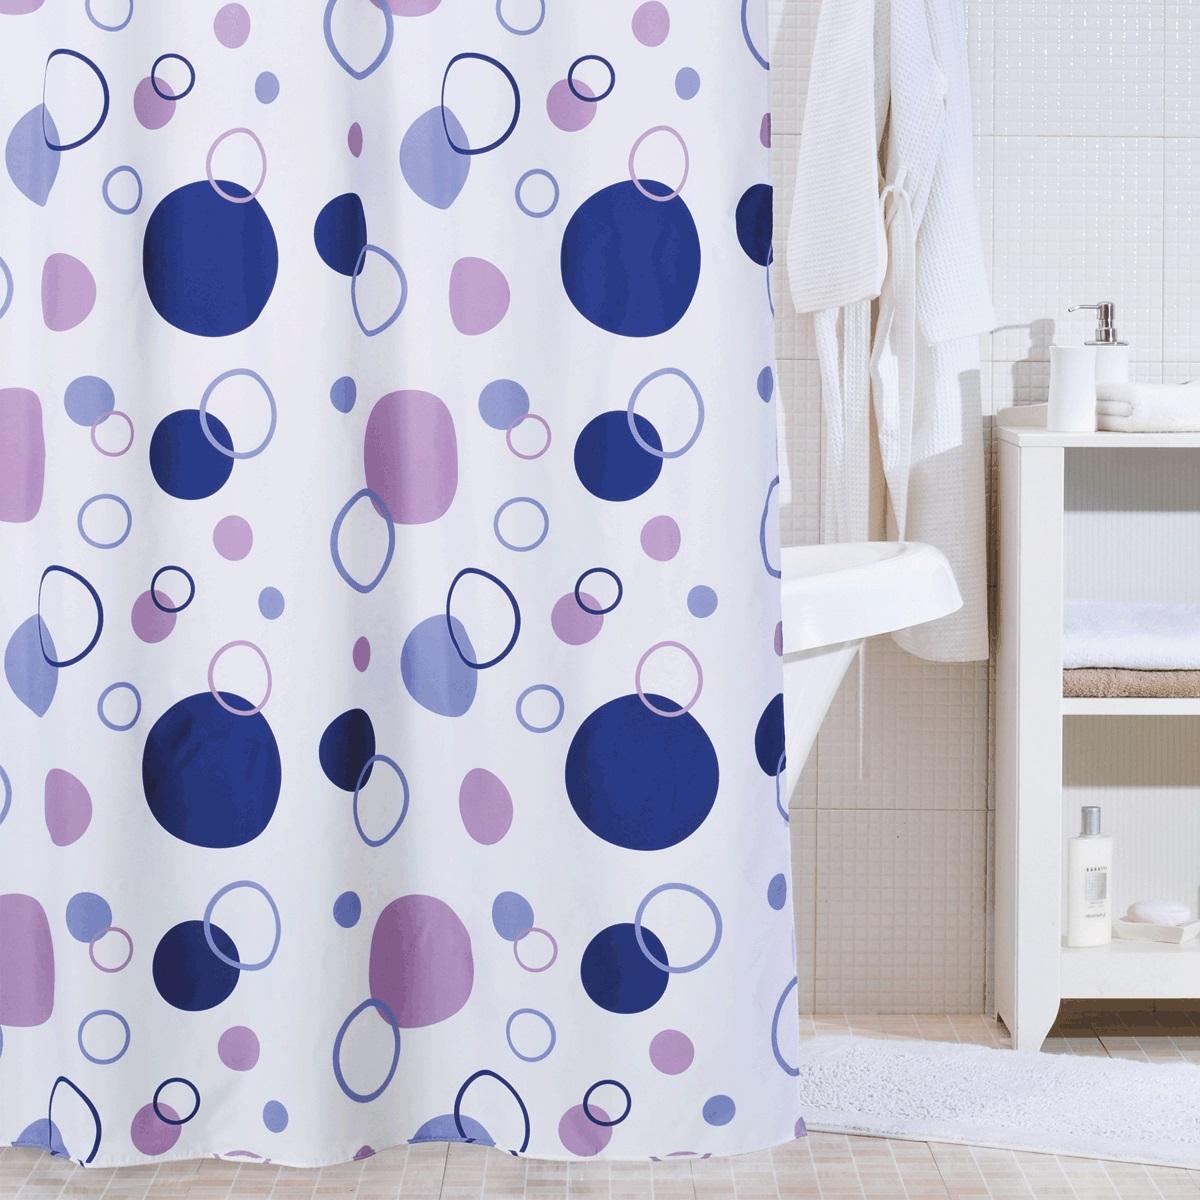 Штора для ванной Iddis Floating Balloon, цвет: мультиколор, 200 x 240 см